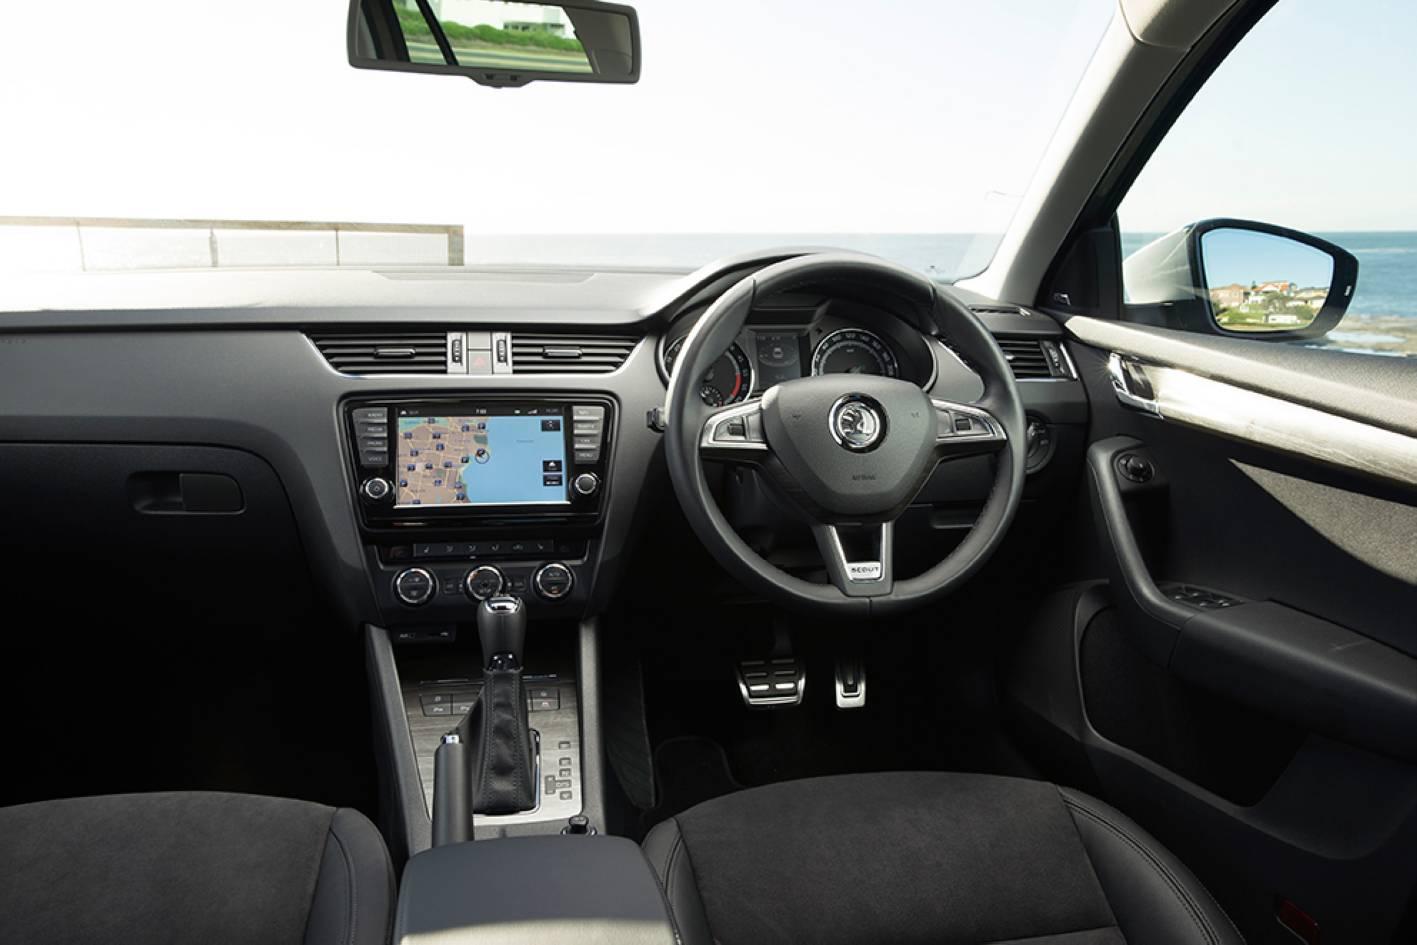 2015 Skoda Octavia Scout 4x4-interior |